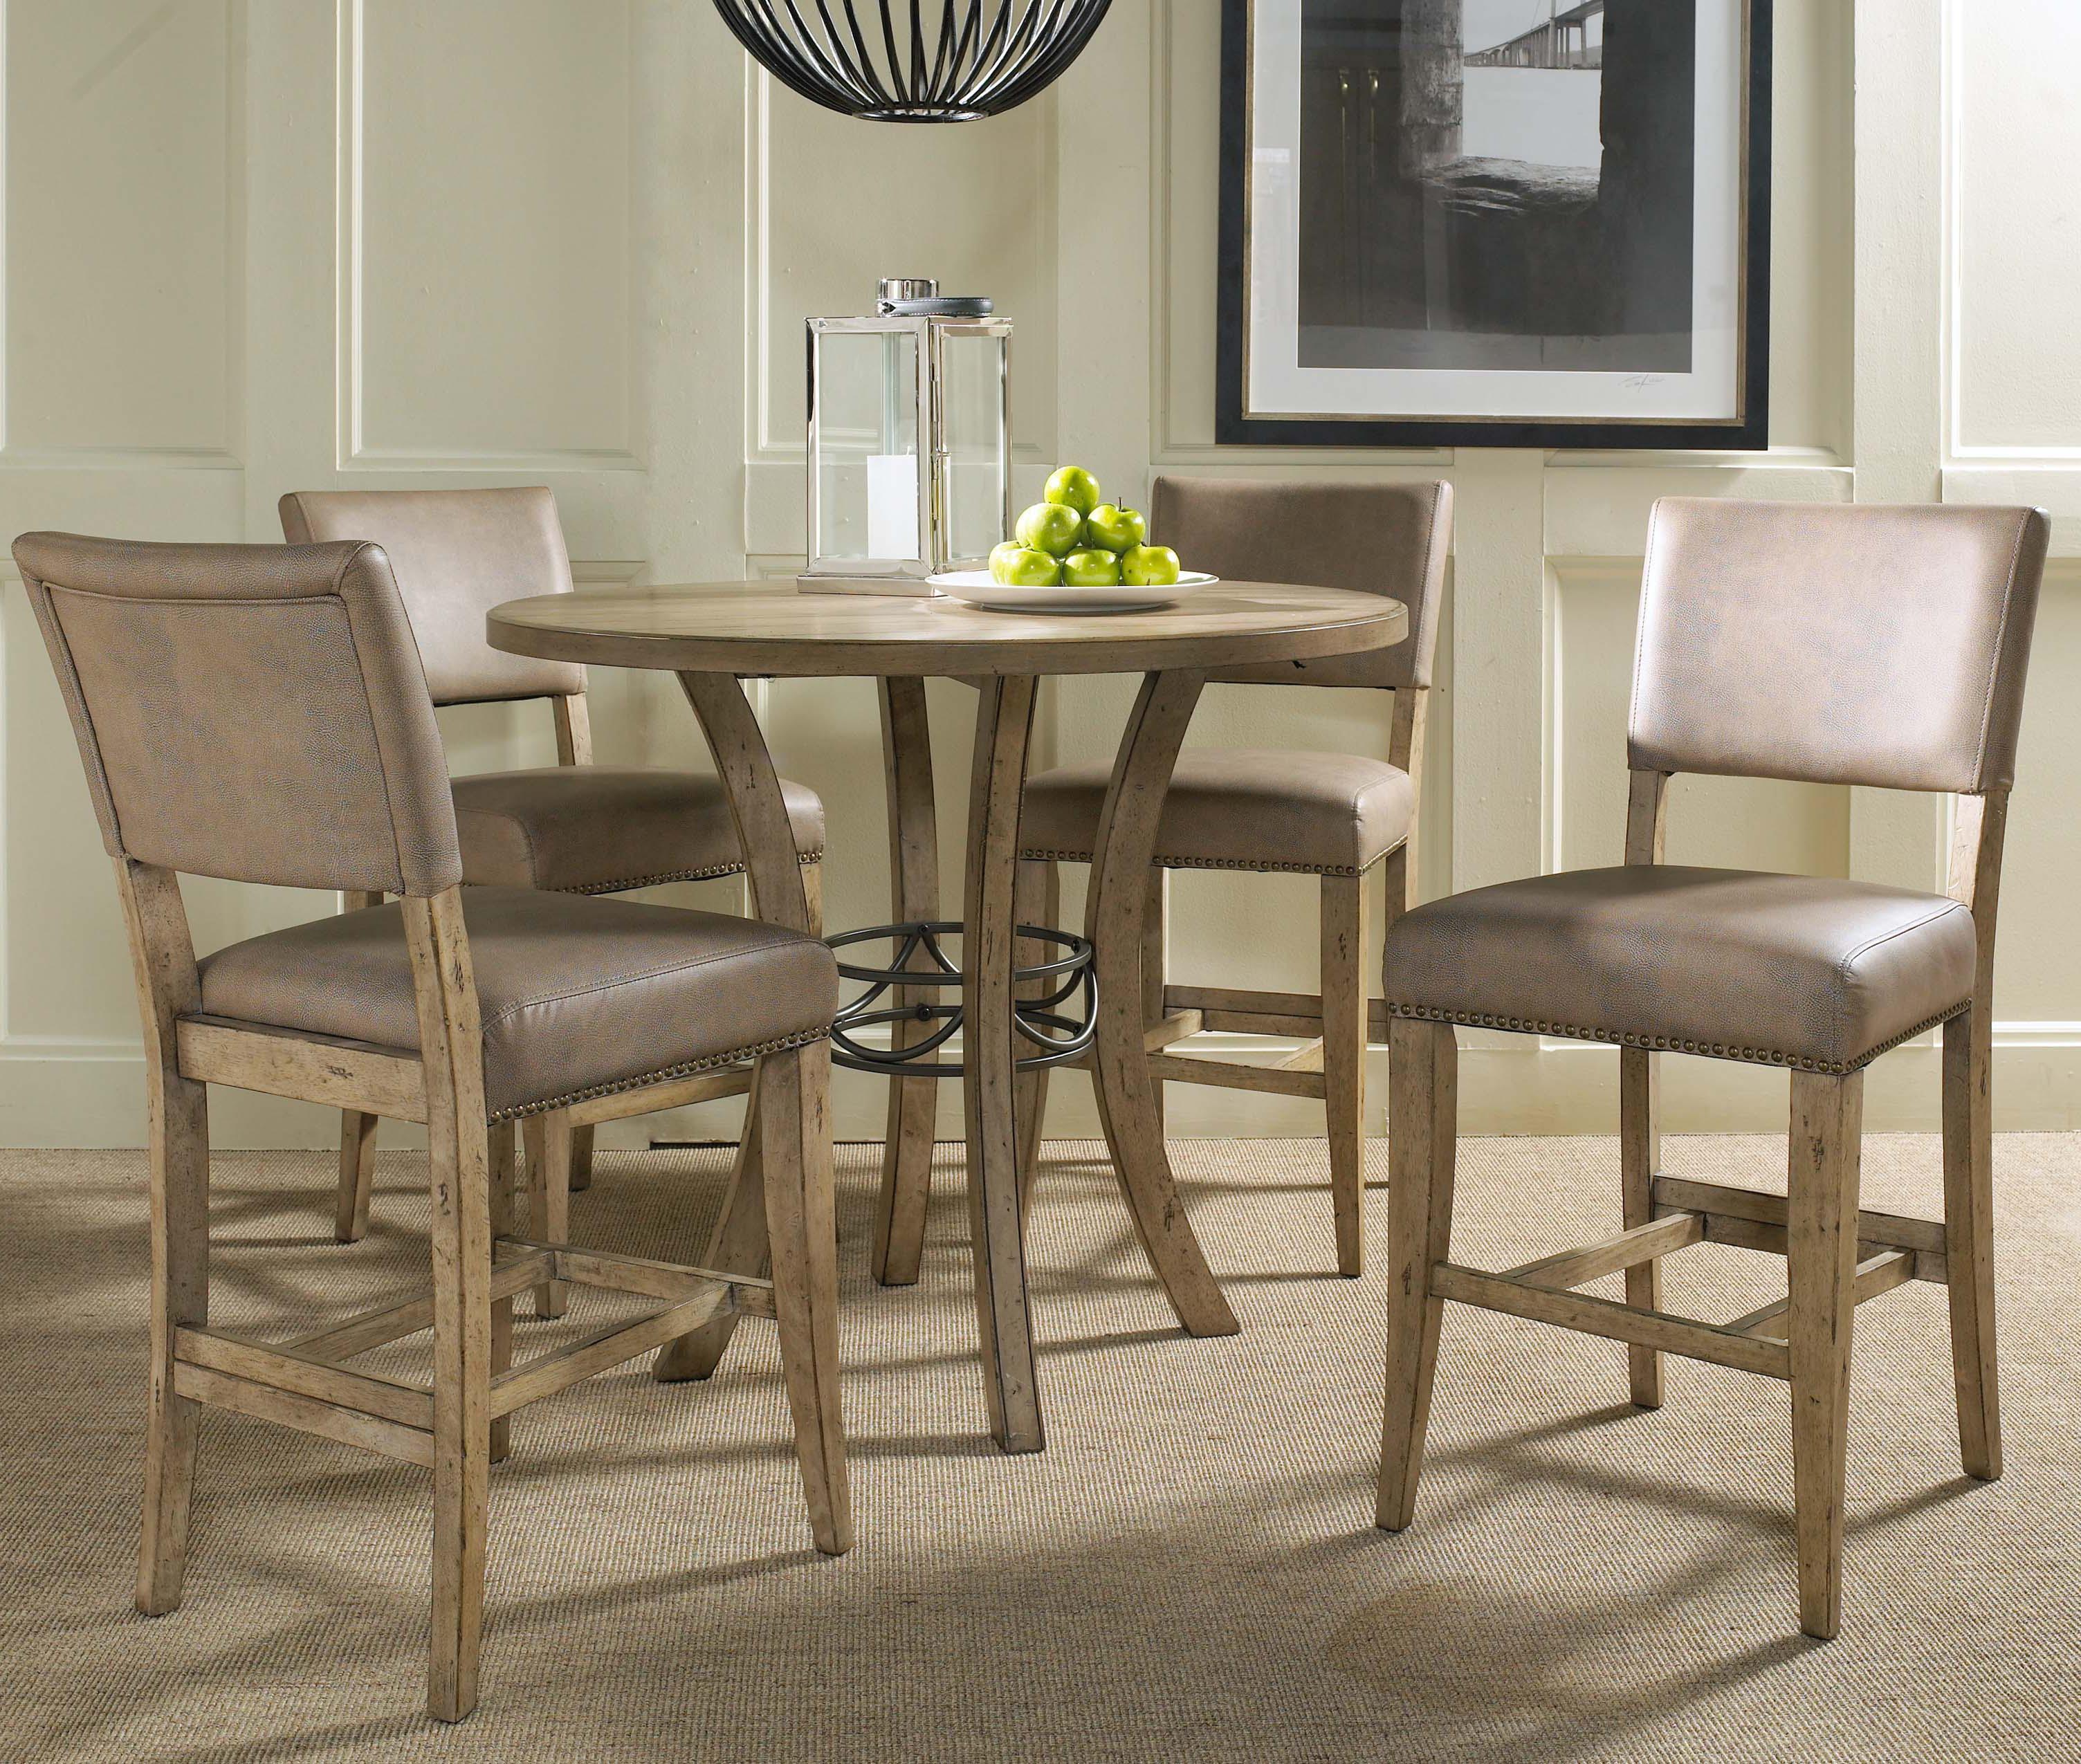 Hillsdale Charleston 5 Piece Dining Table And Chair Set | Goffena Furniture  U0026 Mattress Center | Dining 5 Piece Set